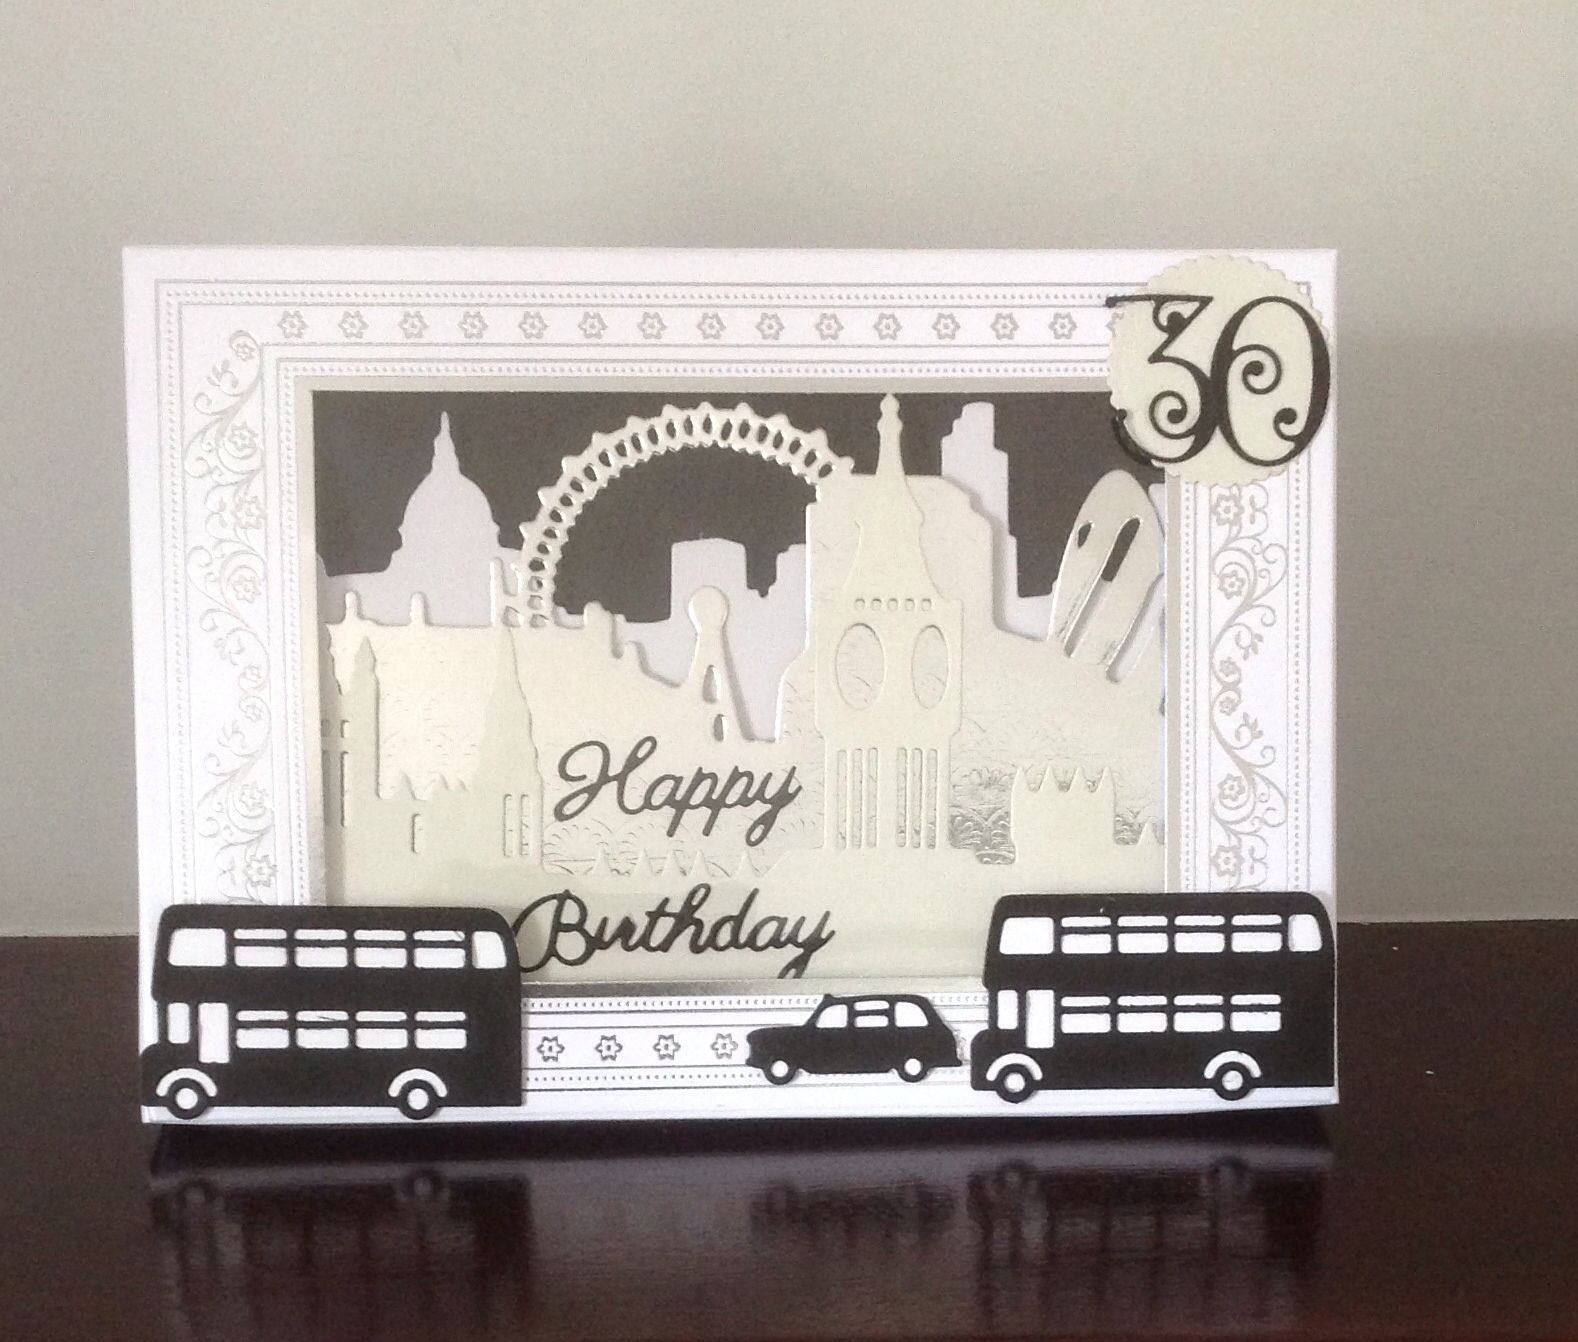 30th Birthday Shadow Box Card Based On Xcut Build A Scene London Dies Scene Cards Cards Shadow Box